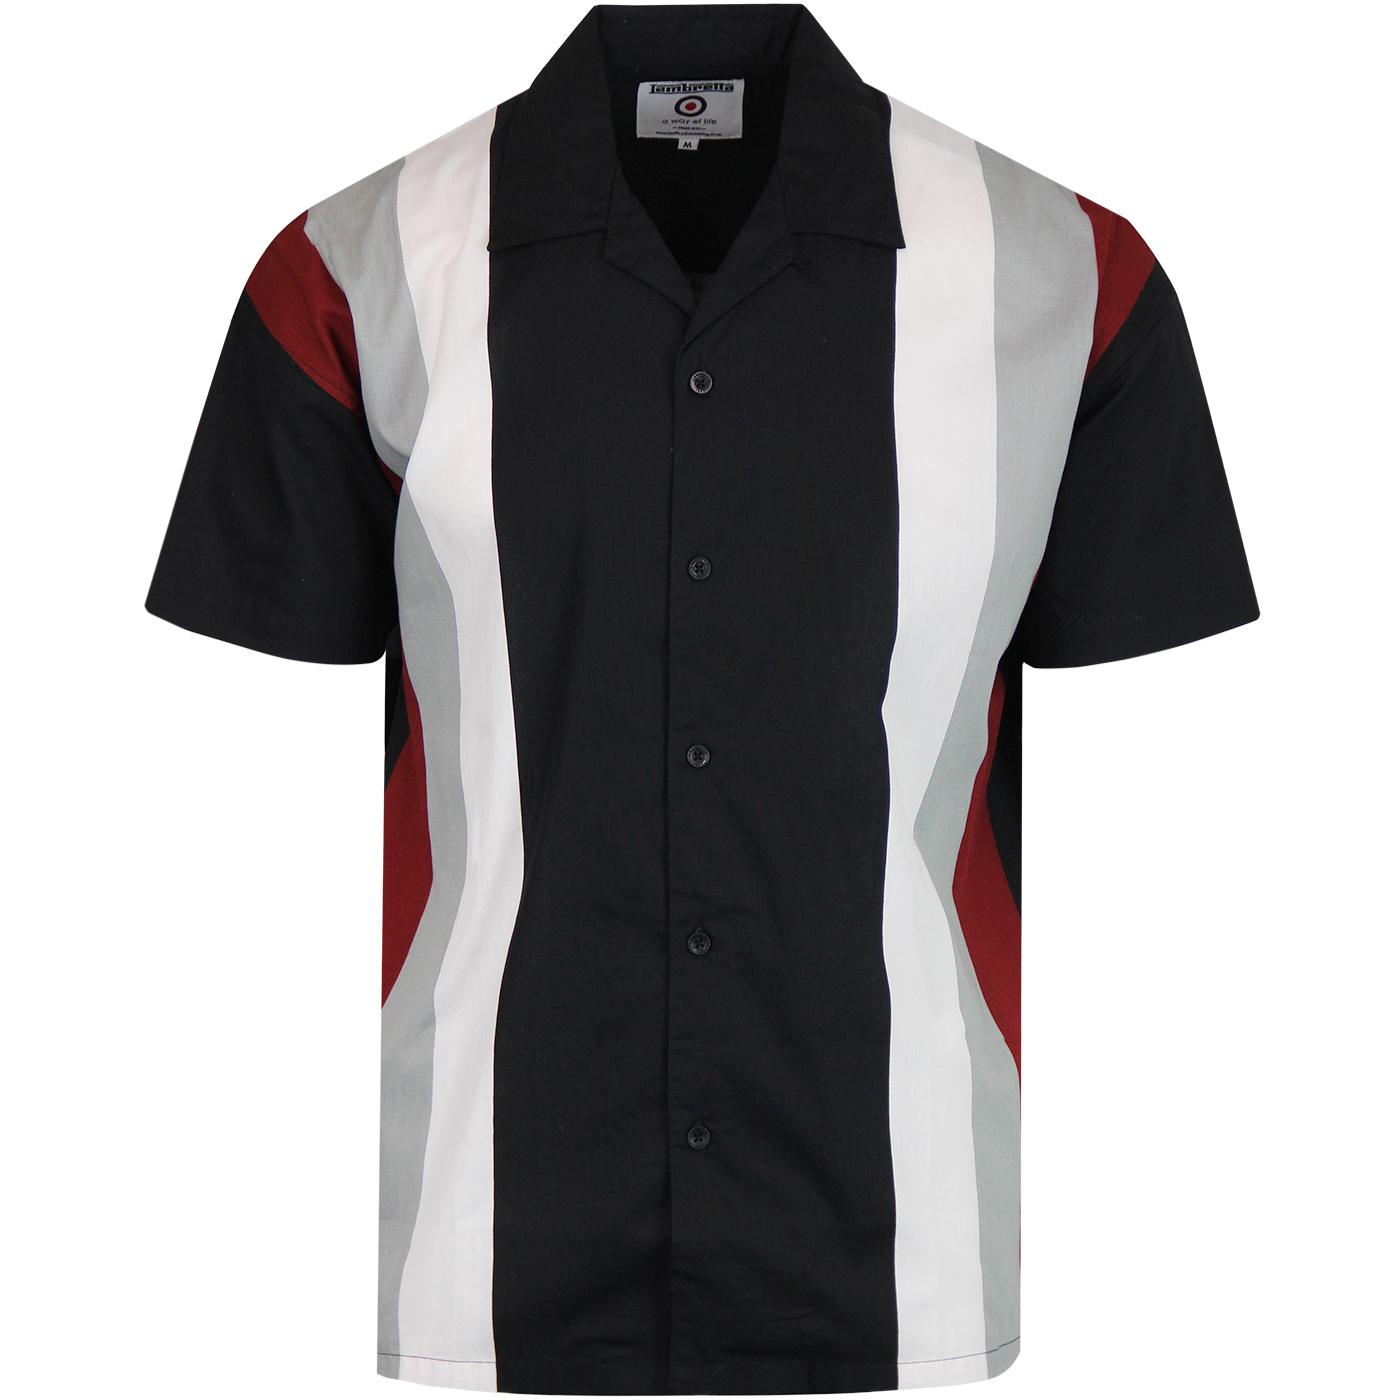 LAMBRETTA Retro Northern Soul Bowling Shirt